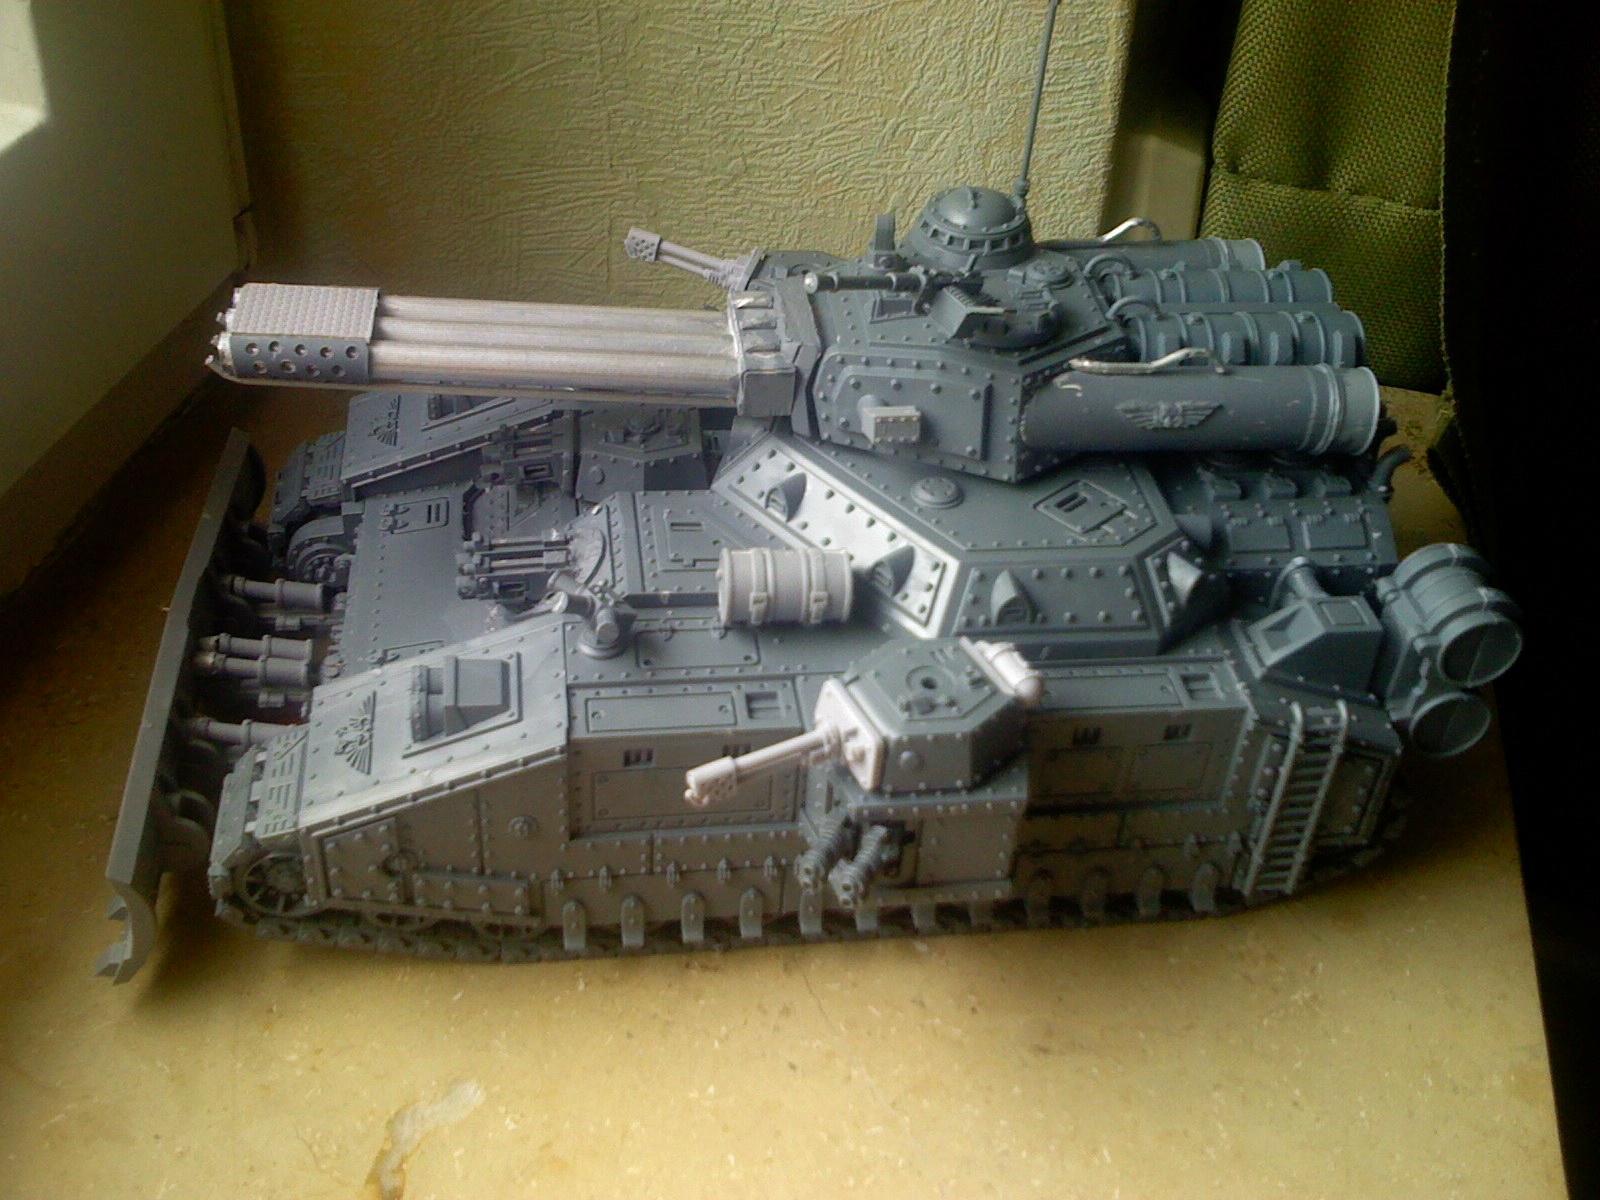 Firesword, Imperial Guard, Super-heavy, Work In Progress